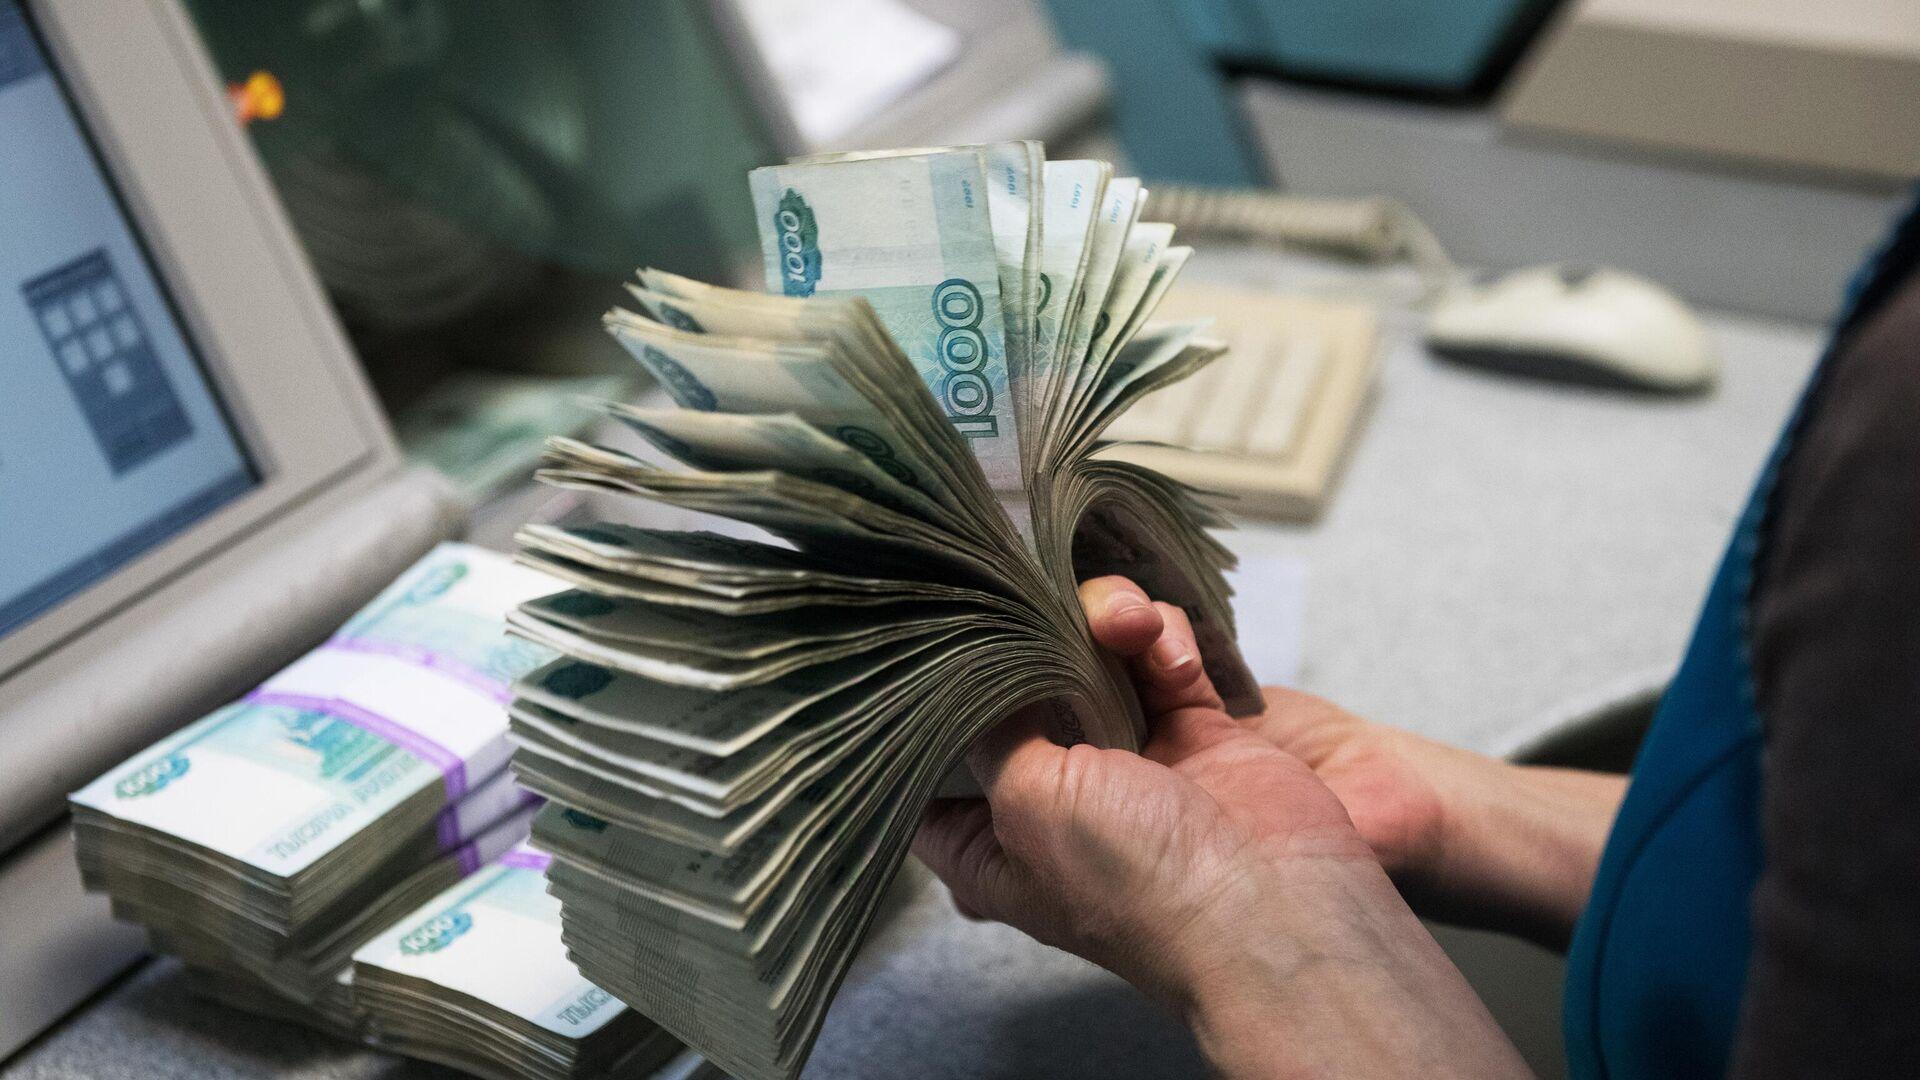 Банкноты номиналом 1000 рублей - Sputnik Тоҷикистон, 1920, 14.08.2021